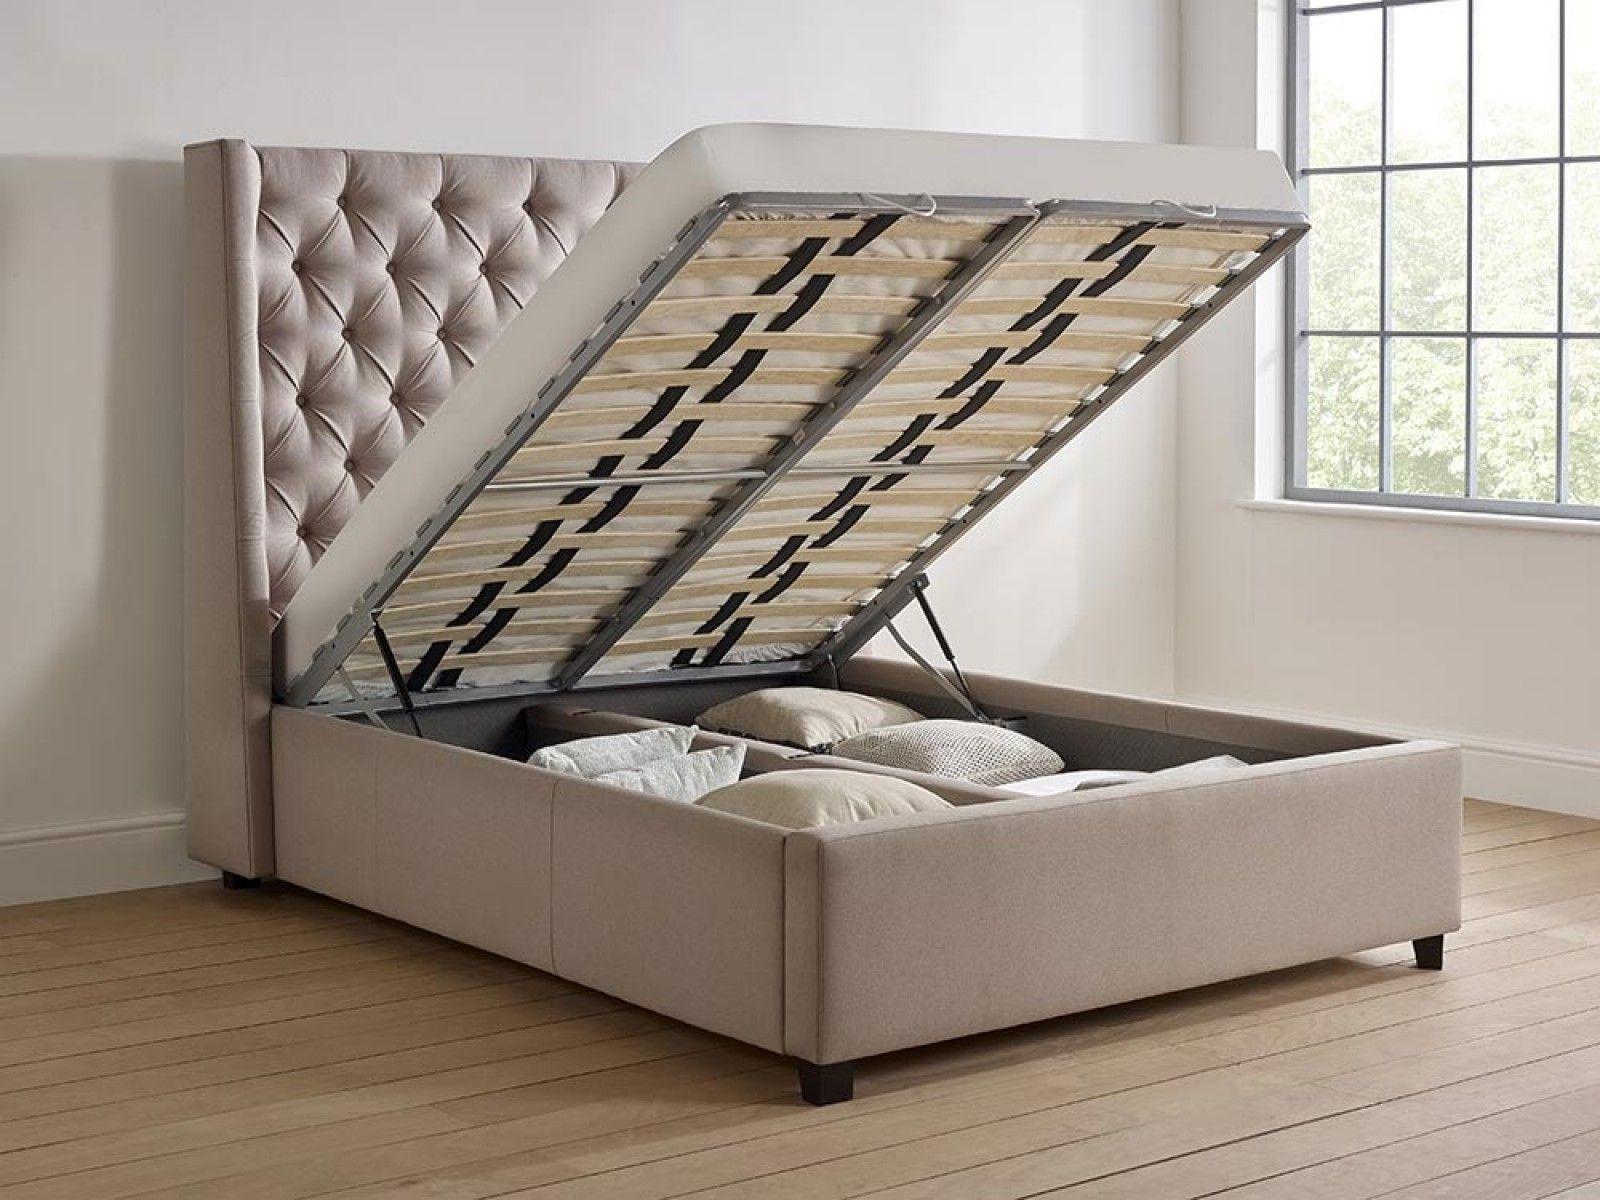 Elise Tall Storage Bed Storage Bed Upholstered Storage Diy